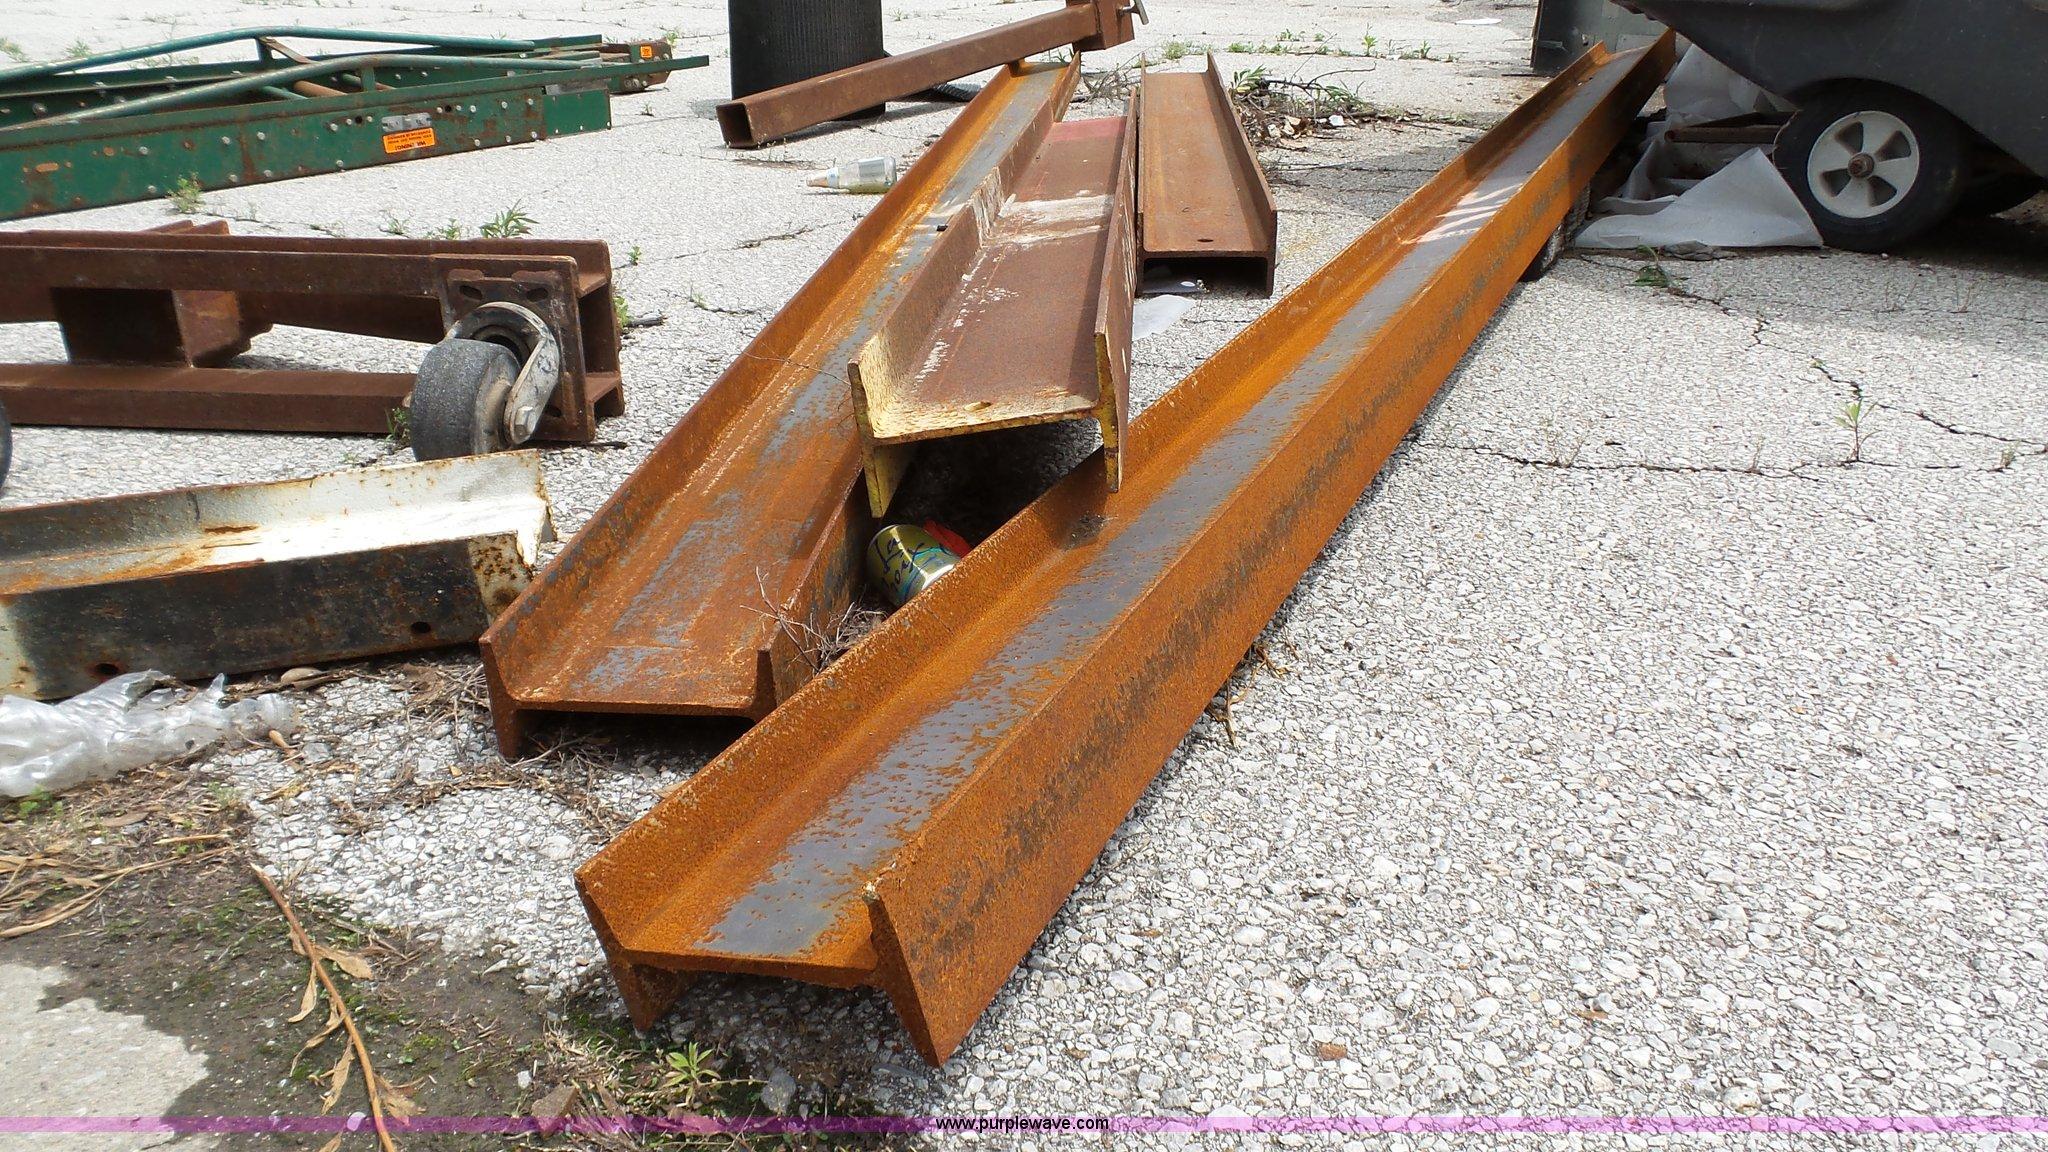 Building materials item bz9474 sold june 10 for I 10 building materials